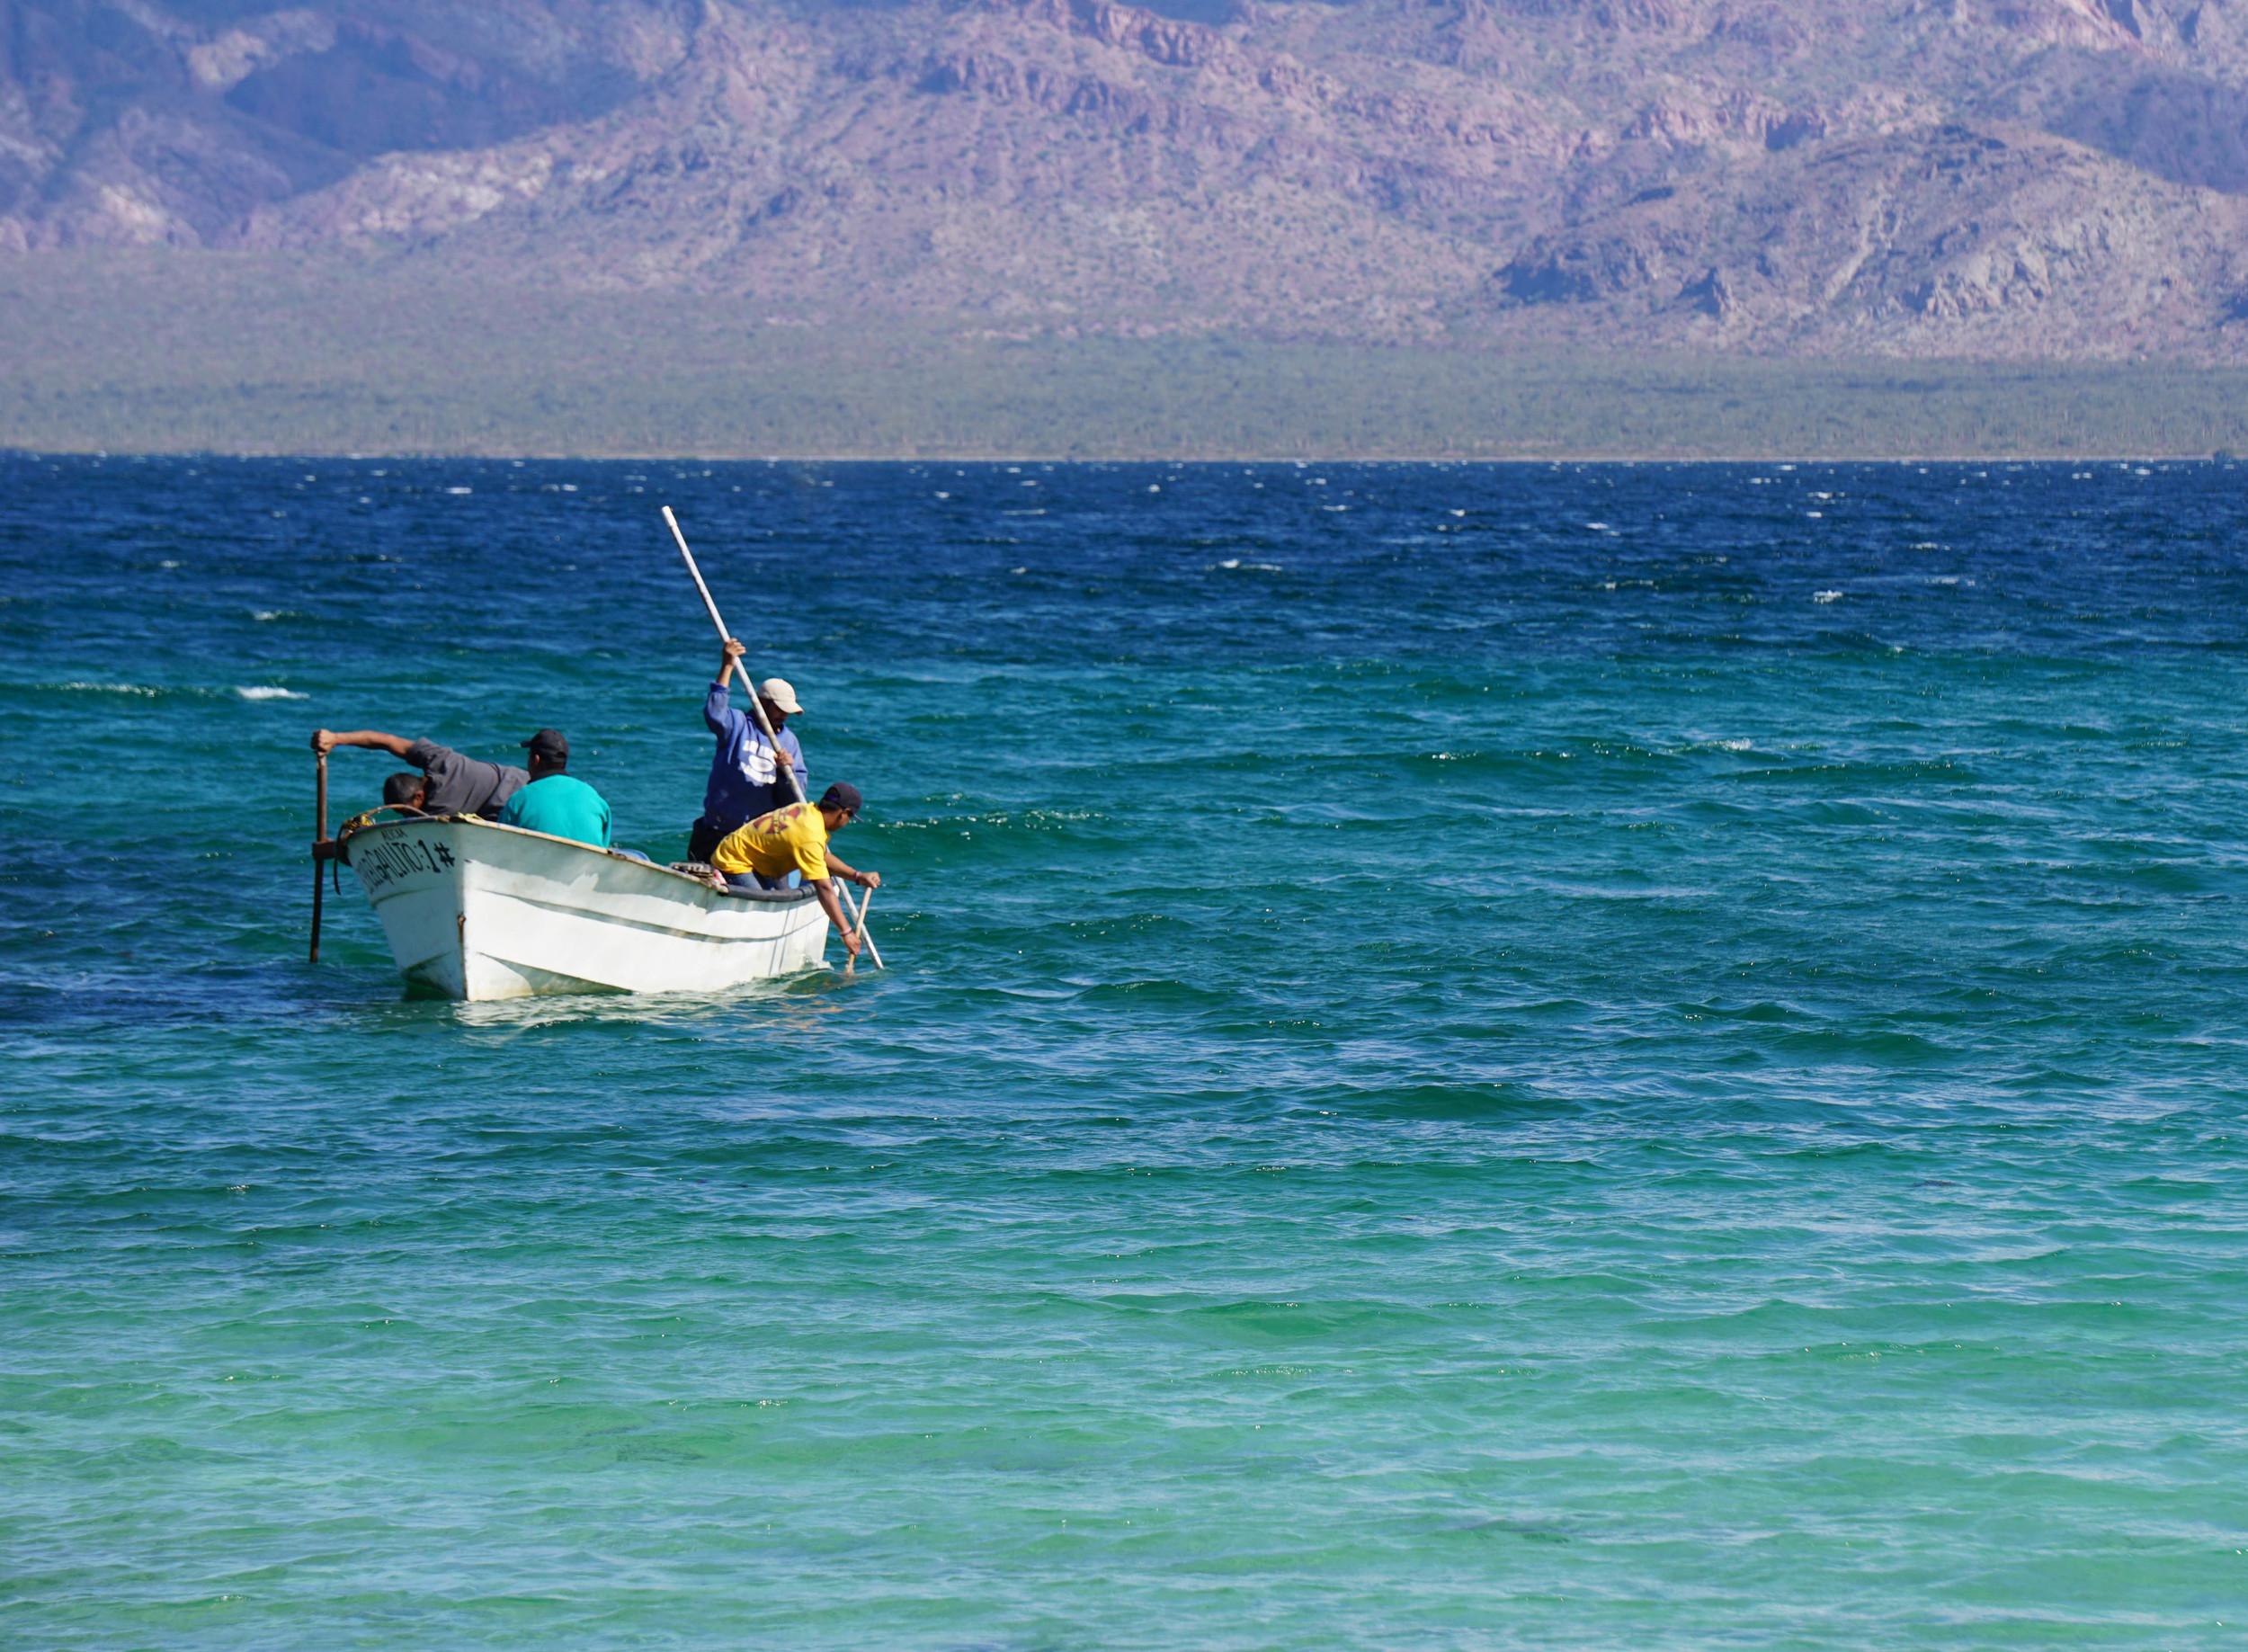 fisherman 4 concepcion edit.jpg